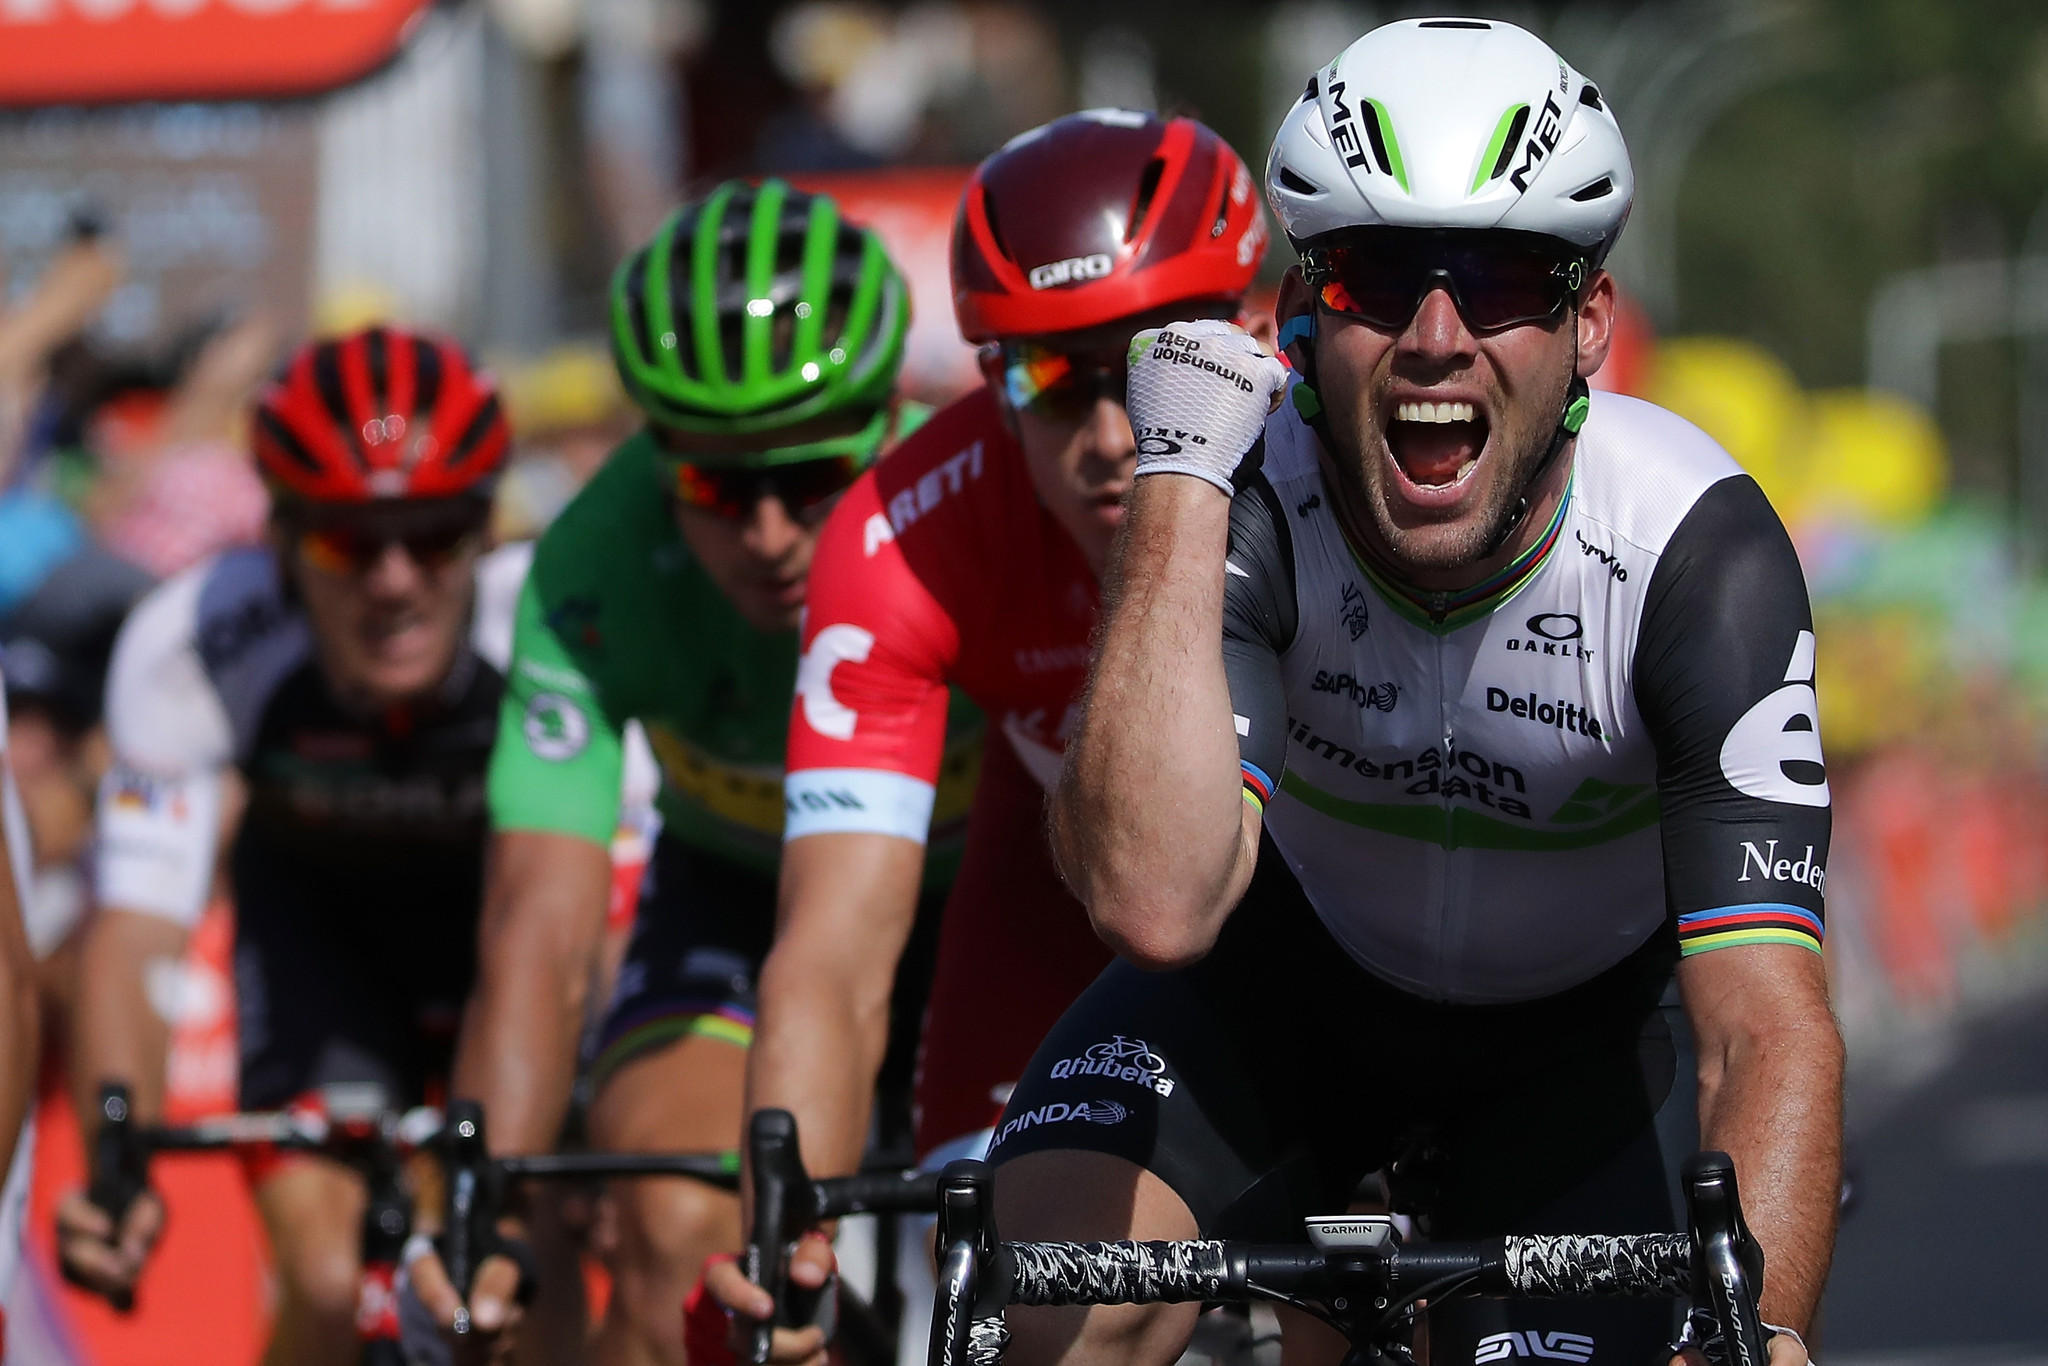 British sprinter Mark Cavendish wins Tour de France Stage ...